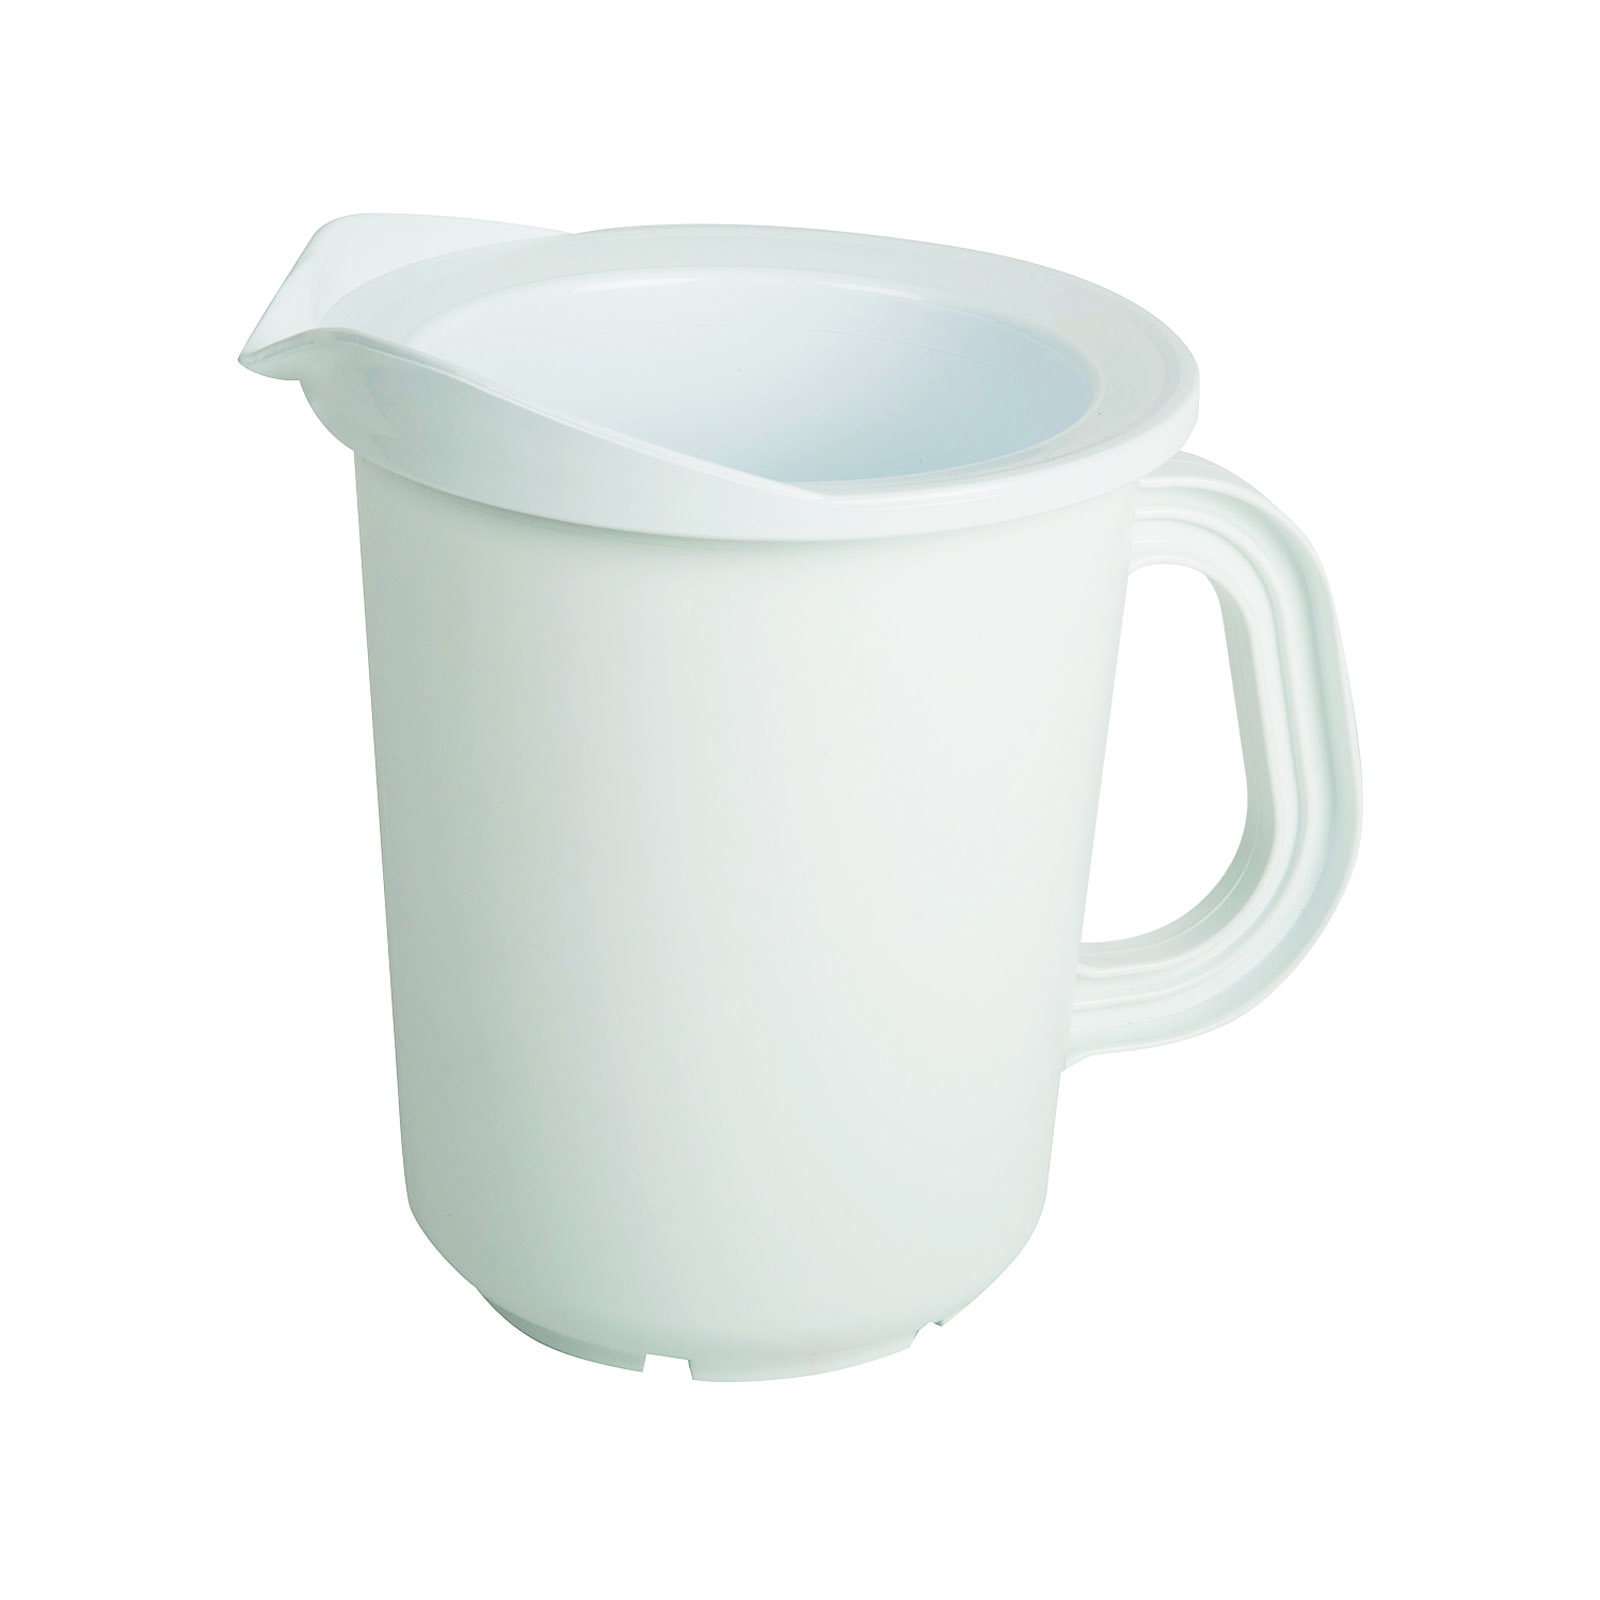 San Jamar CI7025 pitcher, plastic